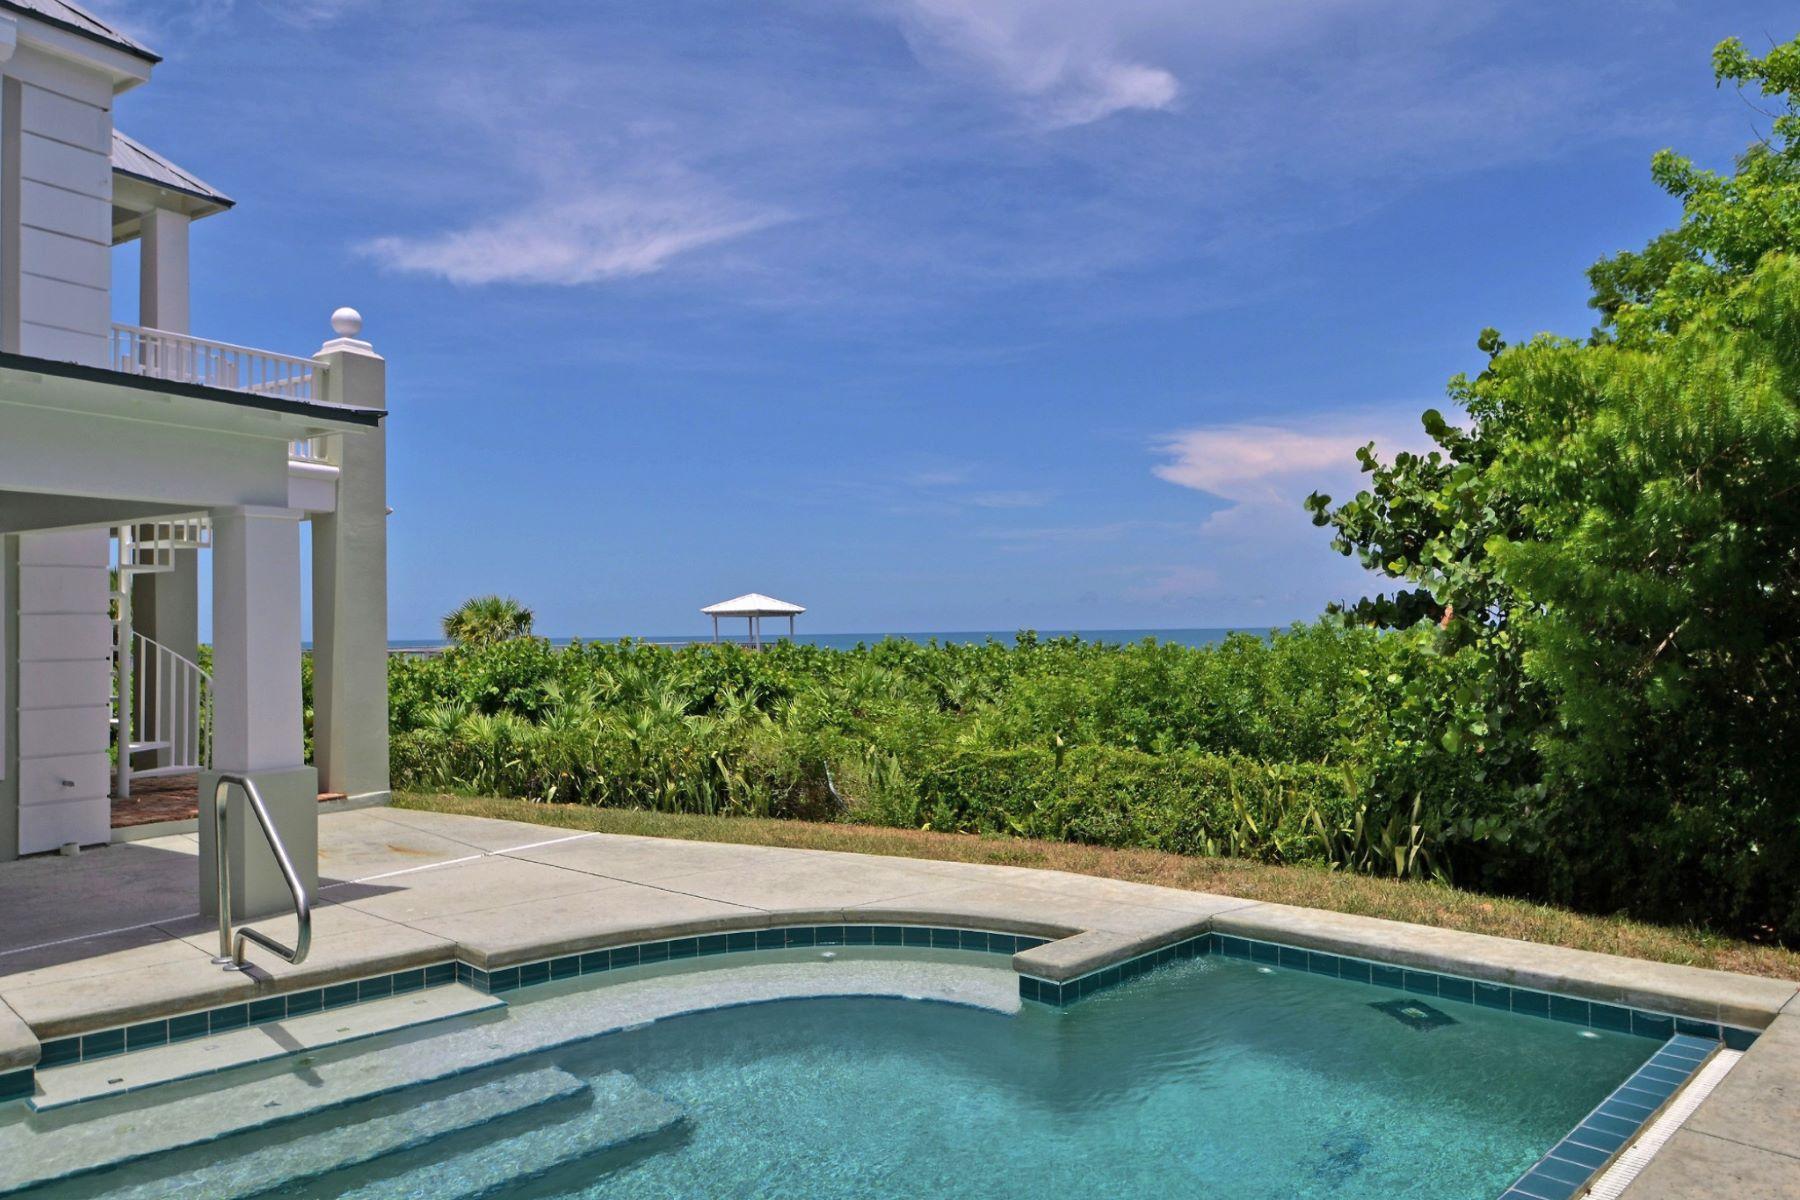 Additional photo for property listing at Oceanfront Estate Home 820 Crescent Beach Road Vero Beach, Φλοριντα 32963 Ηνωμενεσ Πολιτειεσ